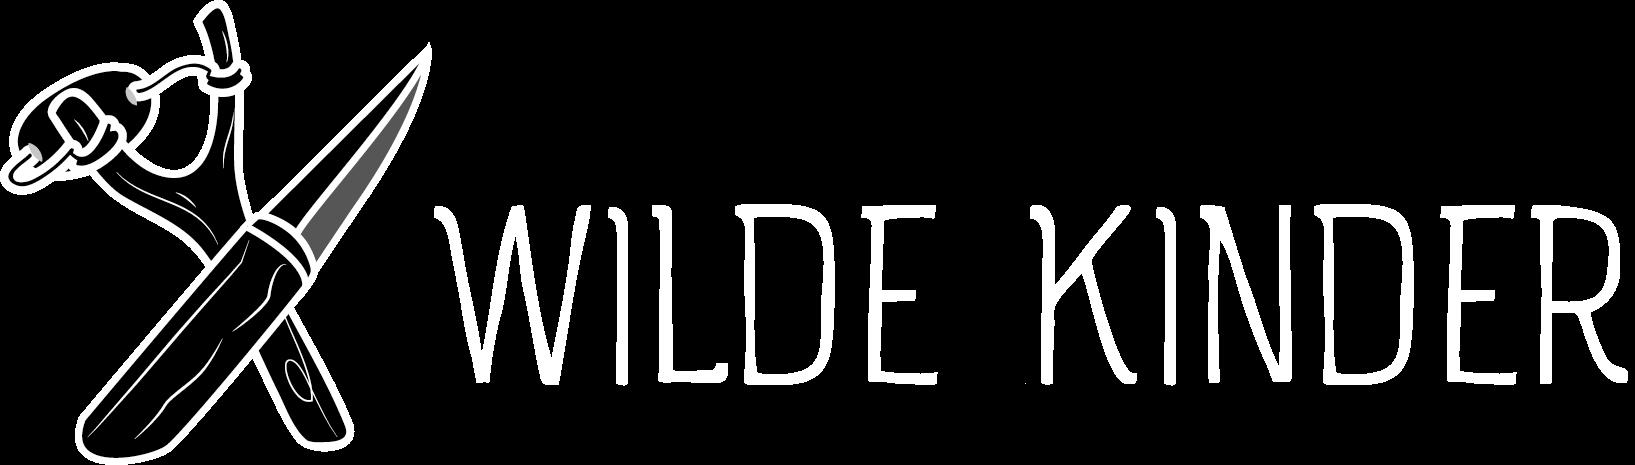 Wilde Kinder